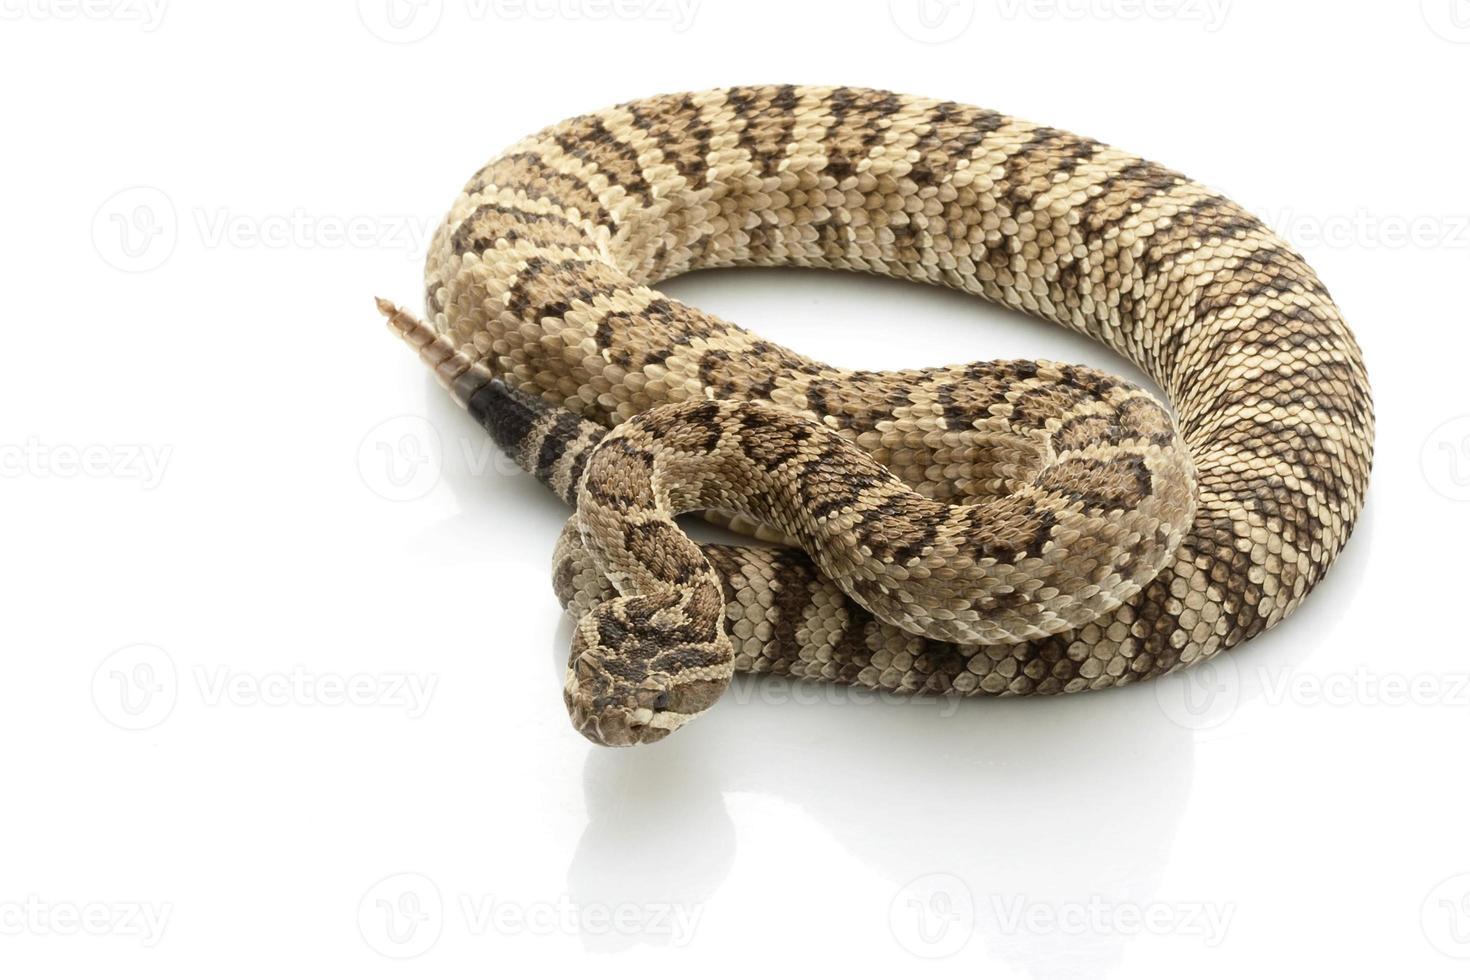 serpente a sonagli grande bacino foto